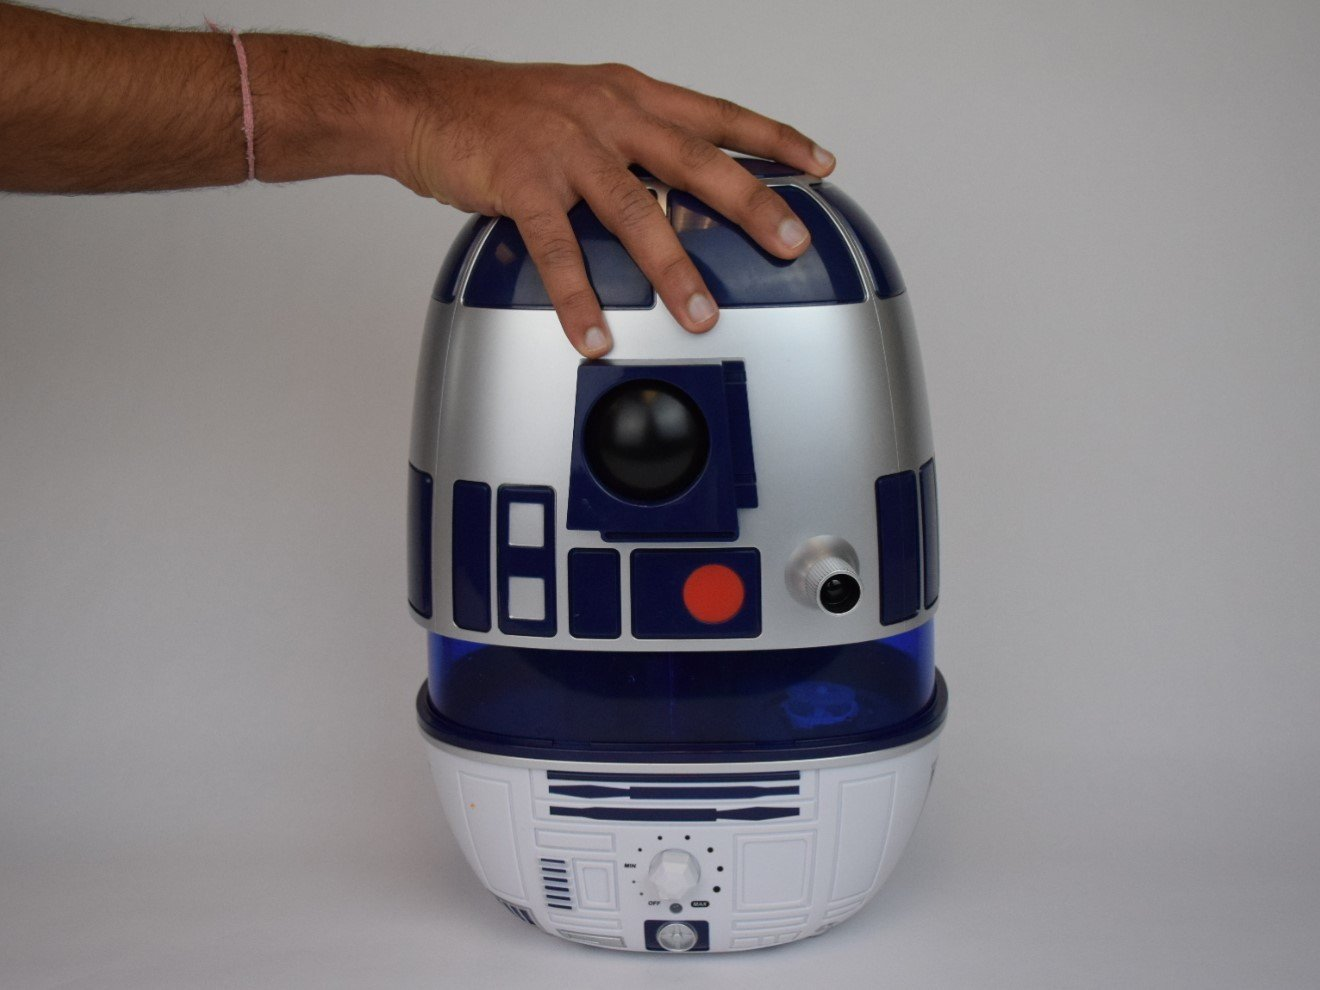 EMSON Star Wars R2-D2 Ultrasonic Cool Mist Humidifier (One Gallon) Teardown